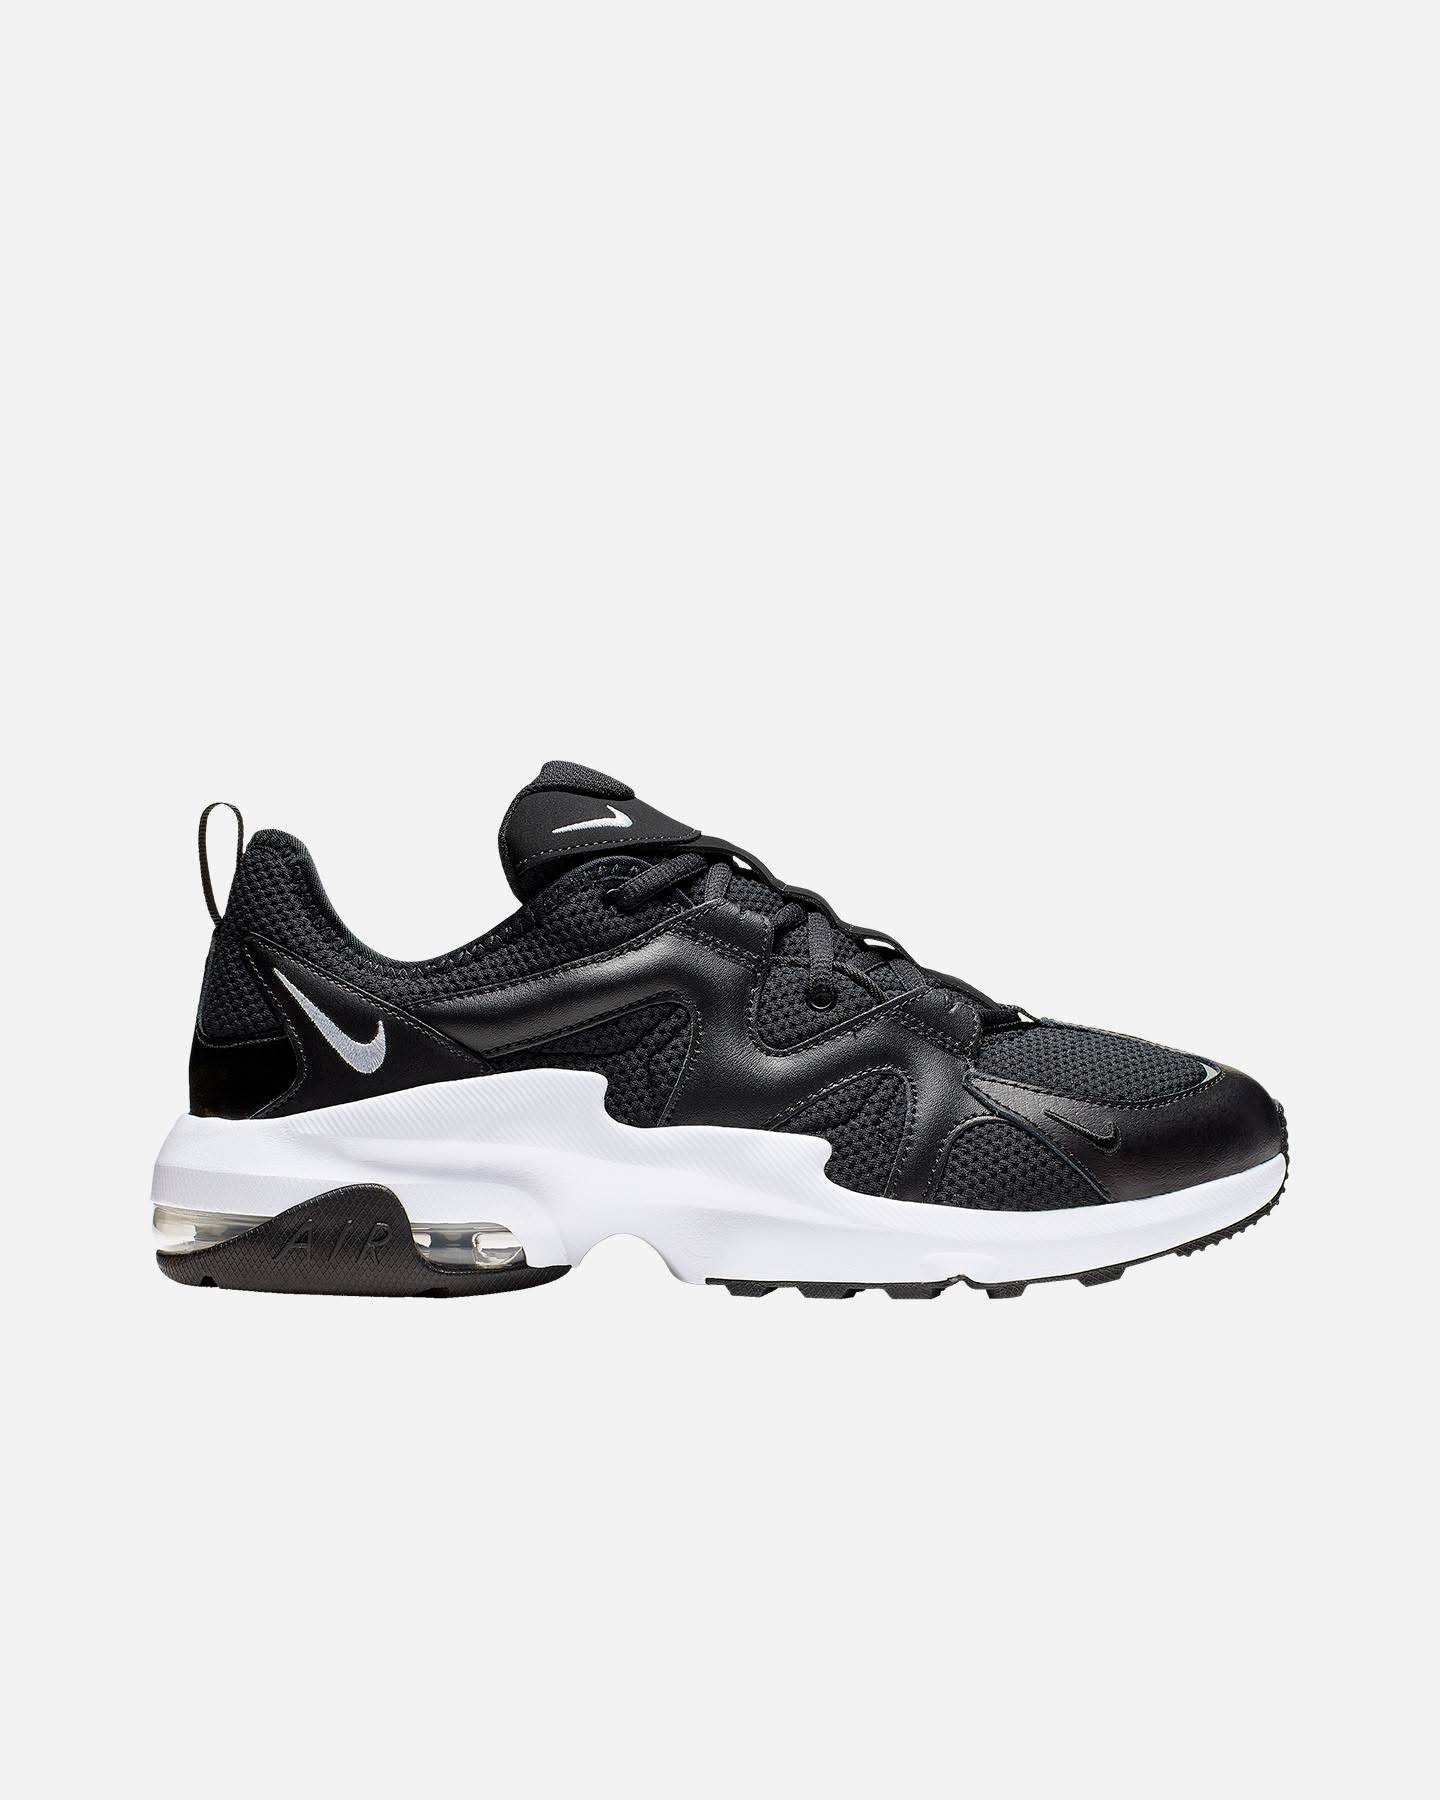 Nike Scarpe Air Max Graviton Uomo Nero 44